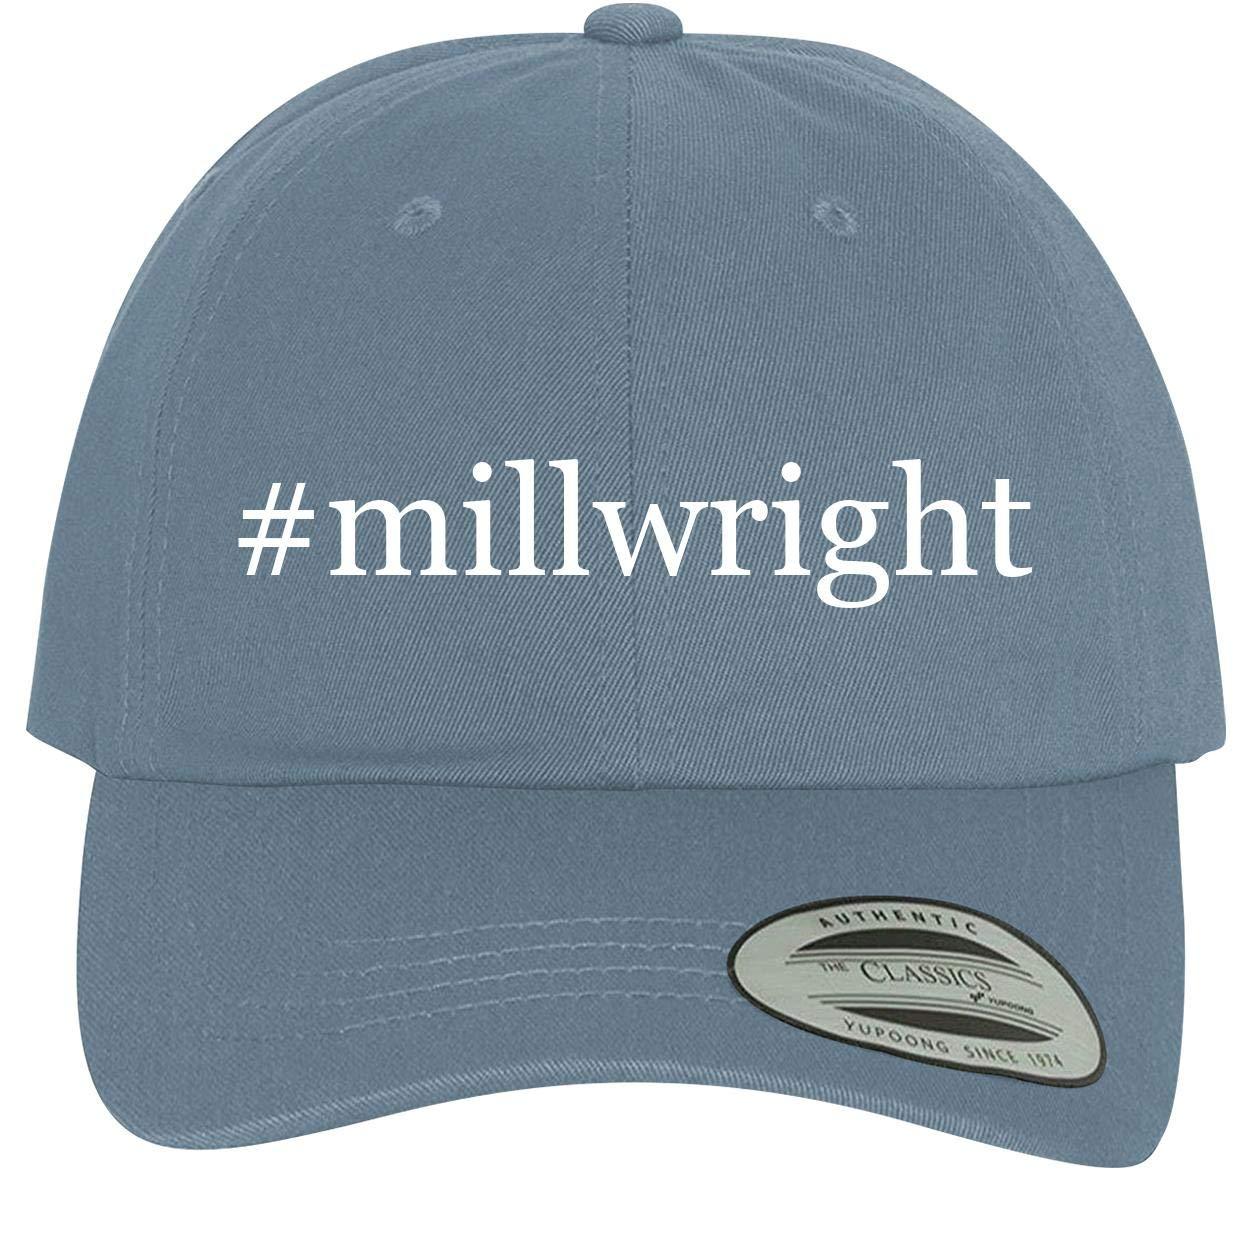 BH Cool Designs #Millwright Comfortable Dad Hat Baseball Cap